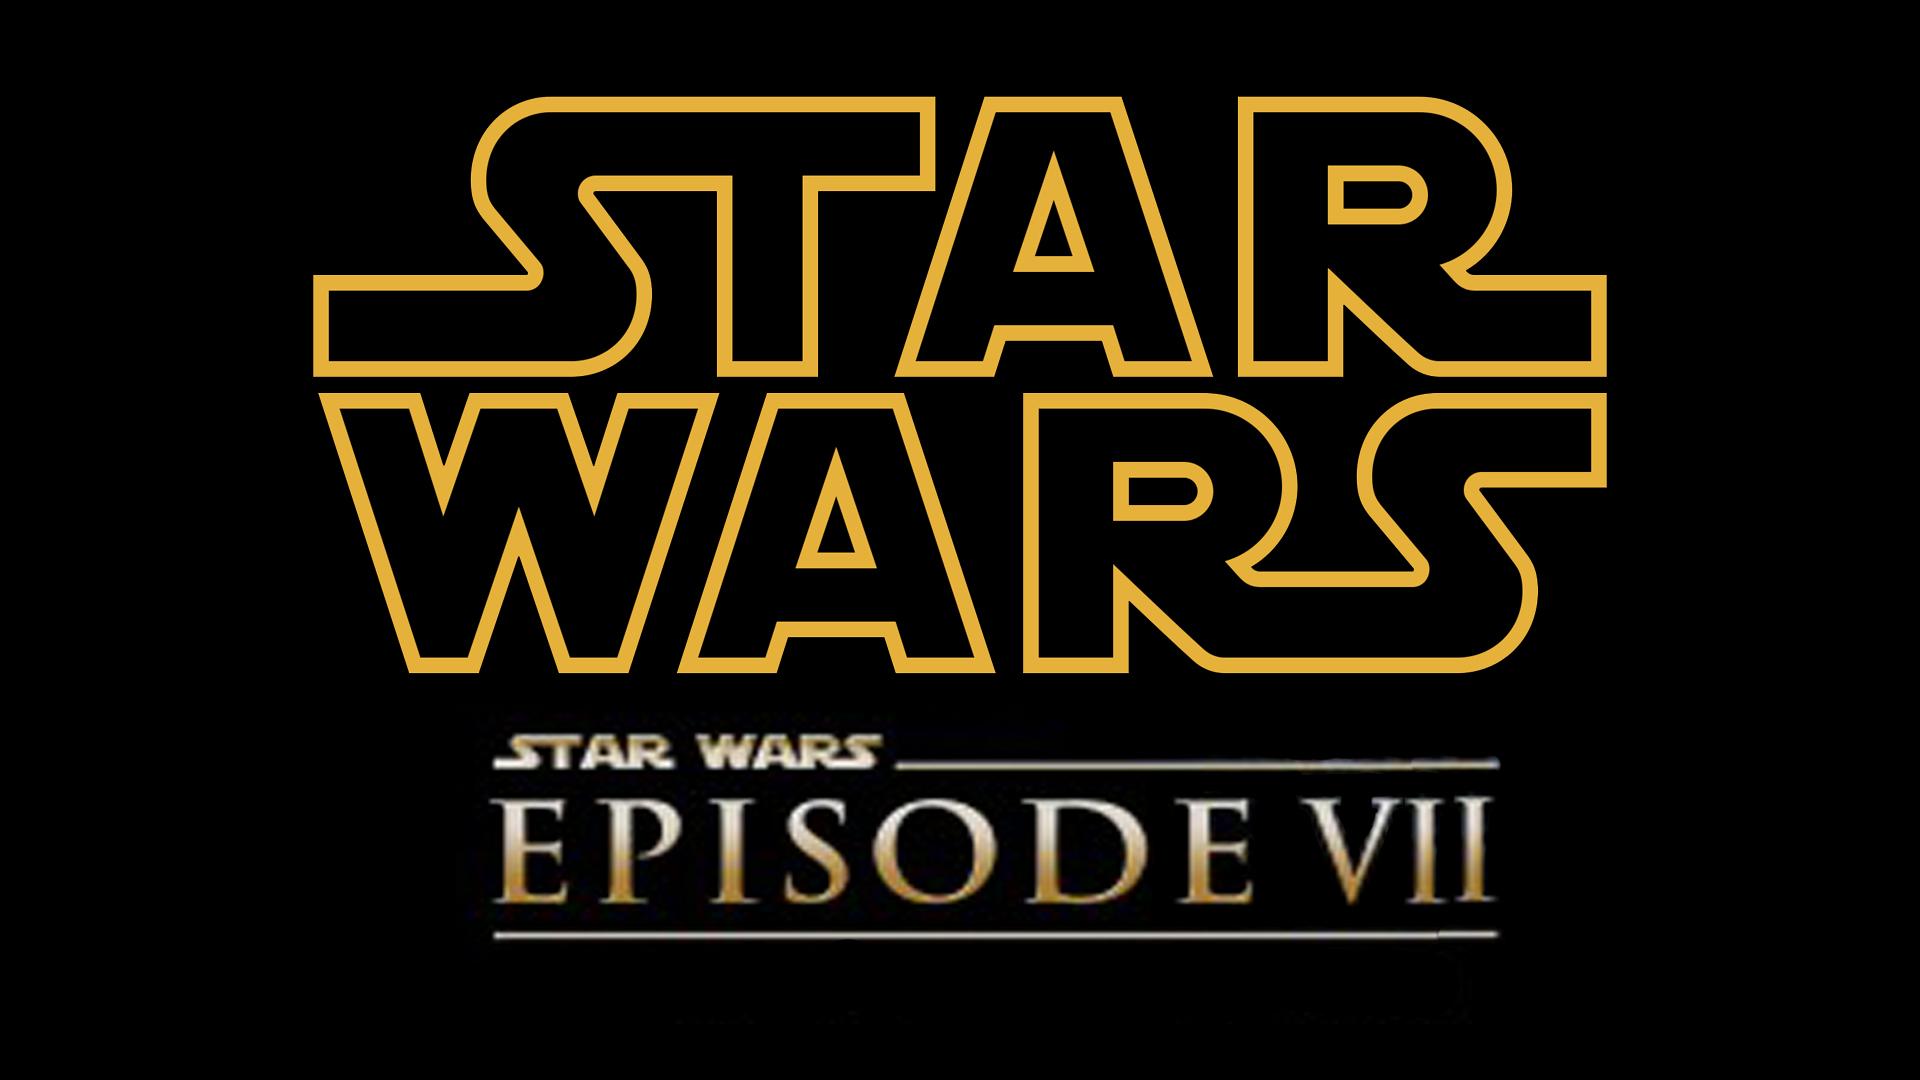 Obi wan i felt a great disturbance in the force as if millions of